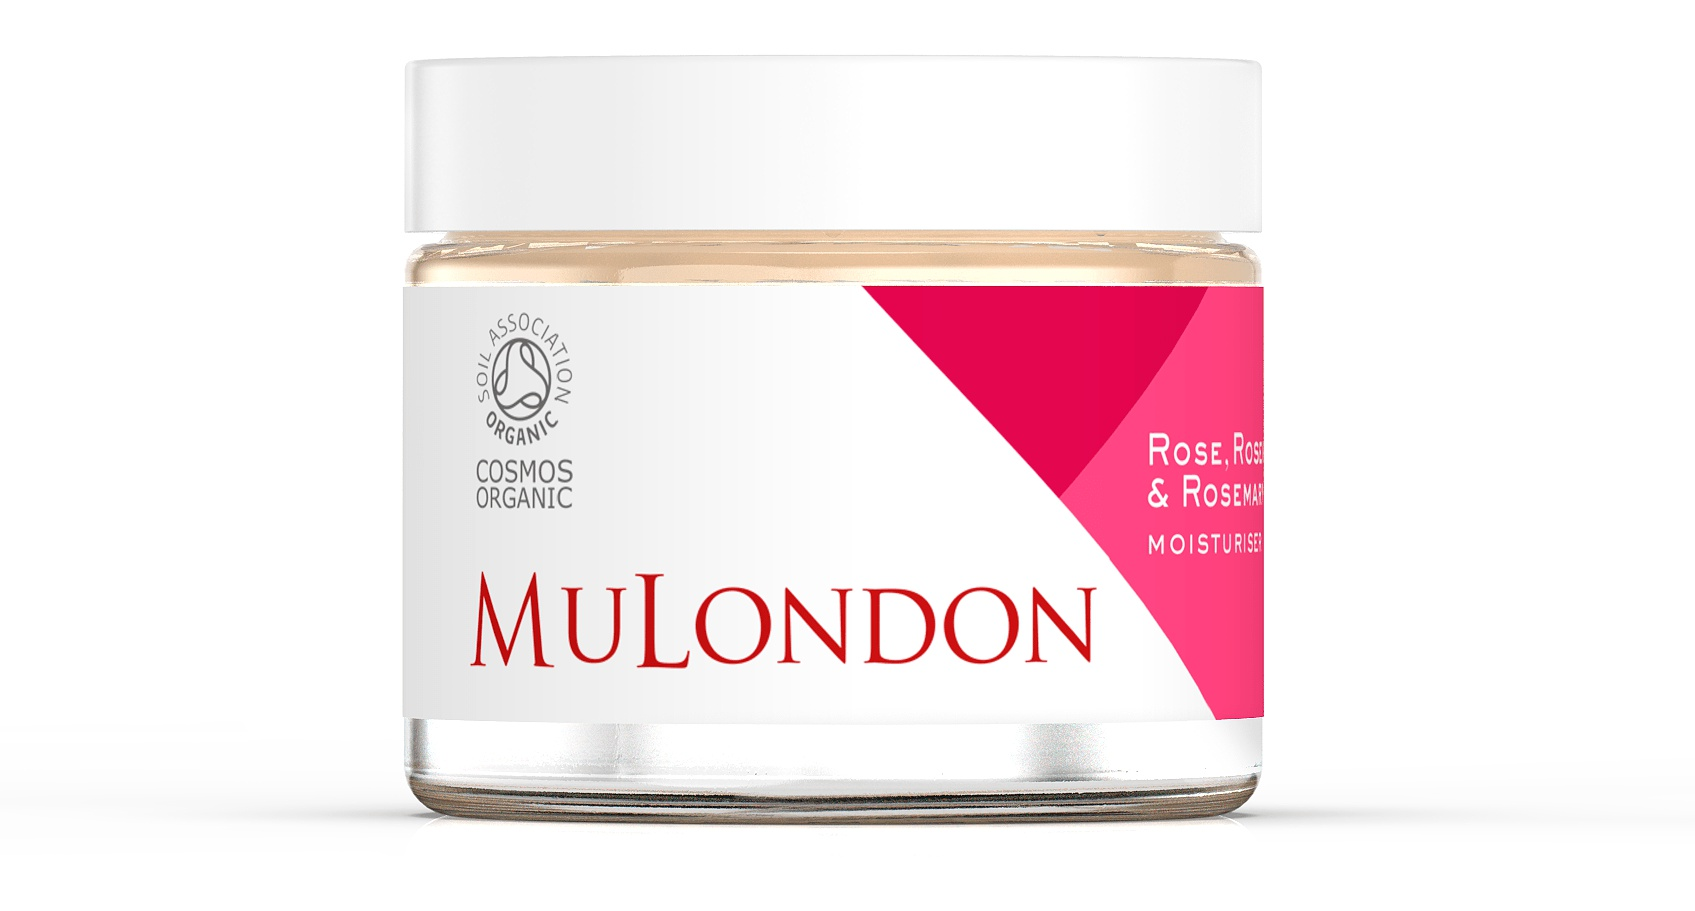 MuLondon Rose, Rosehip & Rosemary Moisturiser